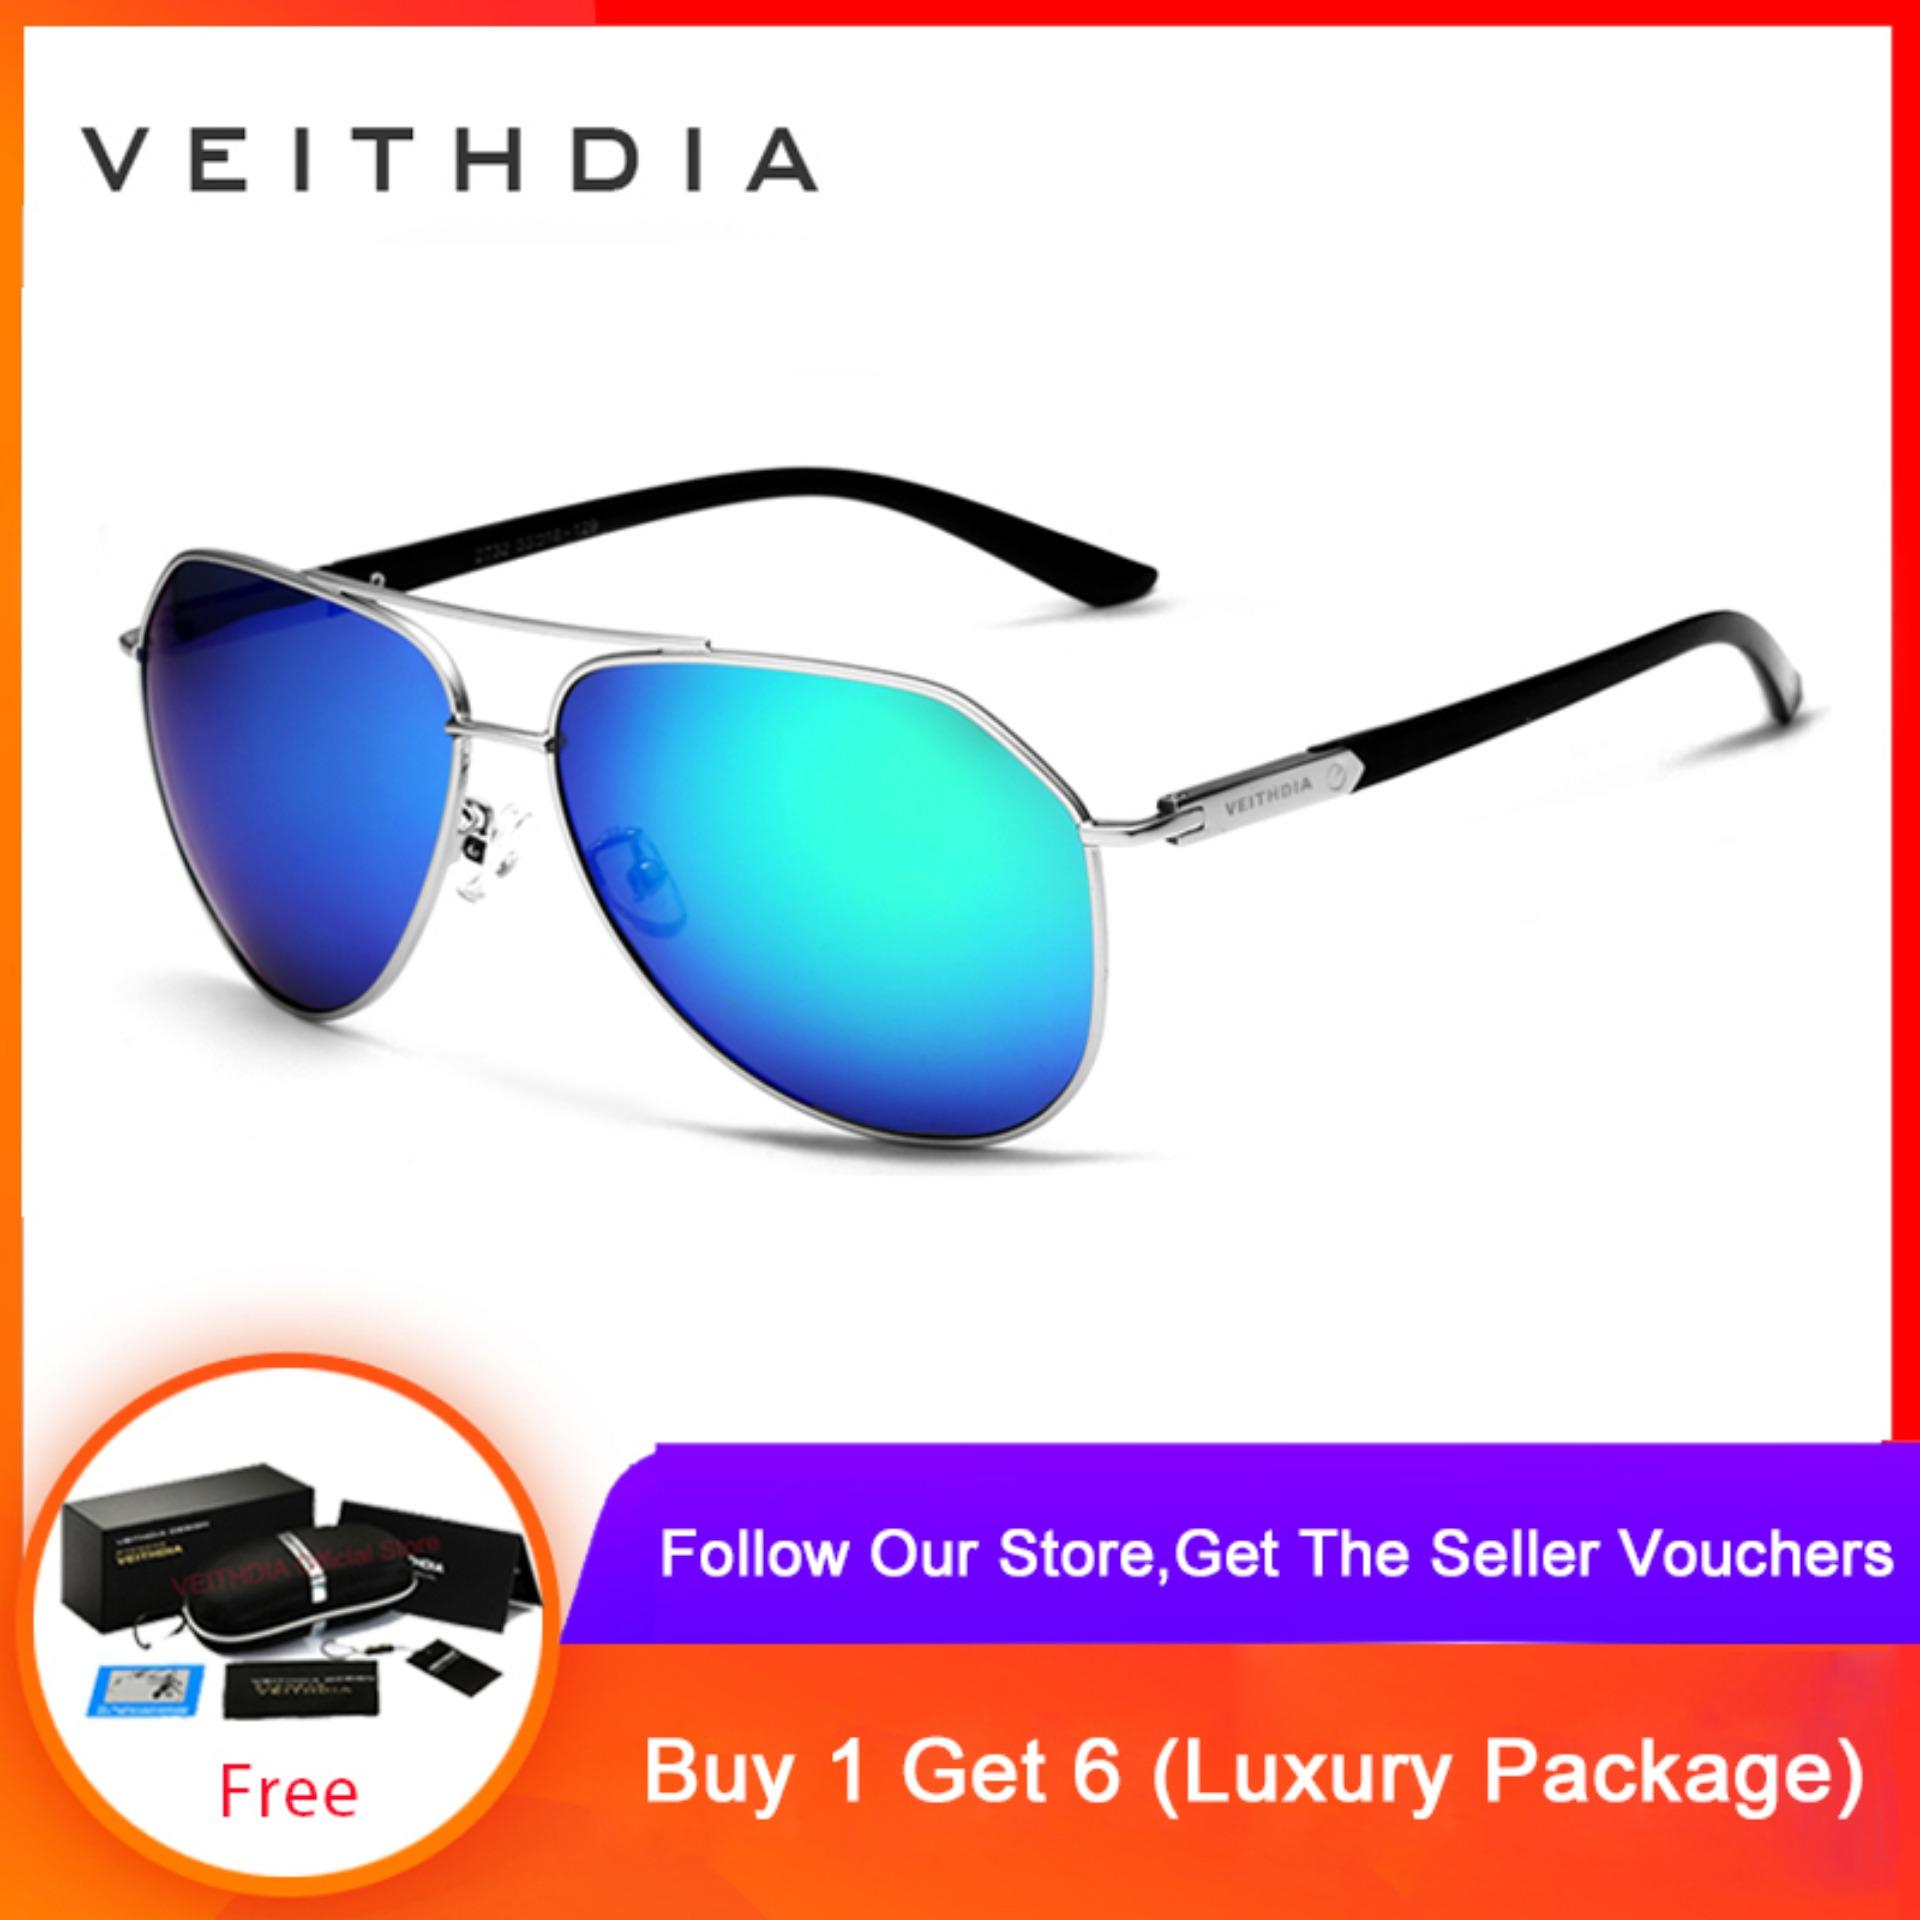 a9d7900a4f8f VEITHDIA Fashion Unisex Sunglasses Polarized Color Coating Mirror glasses  Eyewear For Men/Women 2732